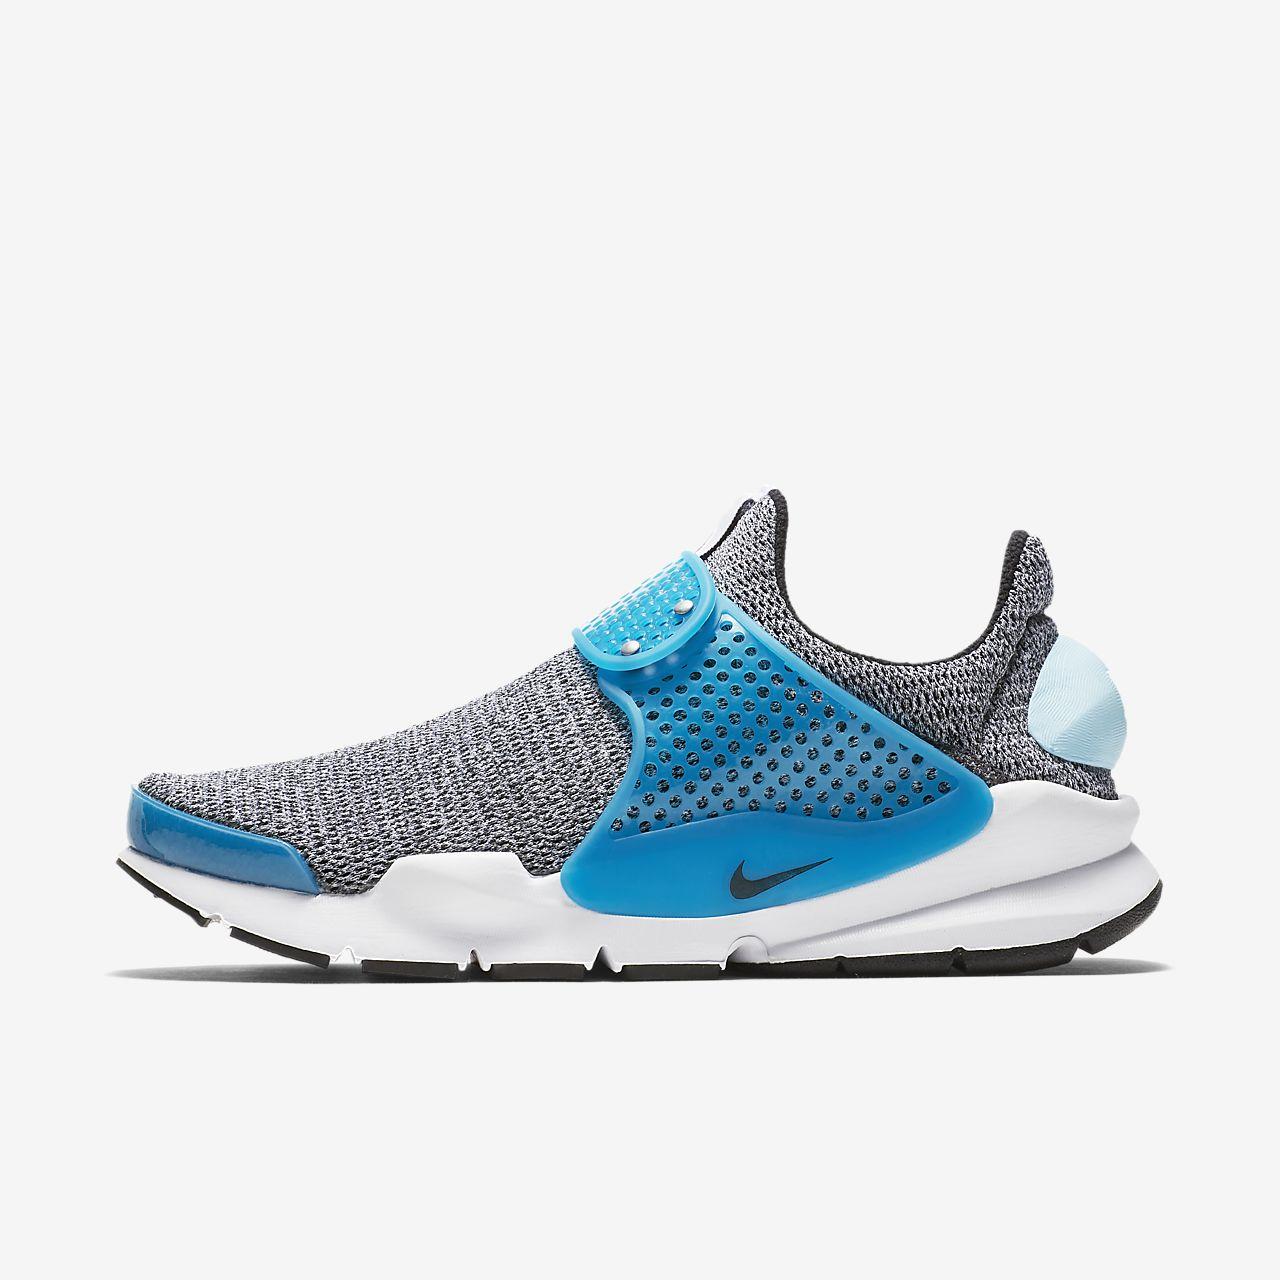 Nike Sock Dart SE Womens 862412-002 Blue Lagoon Black White Running Shoes